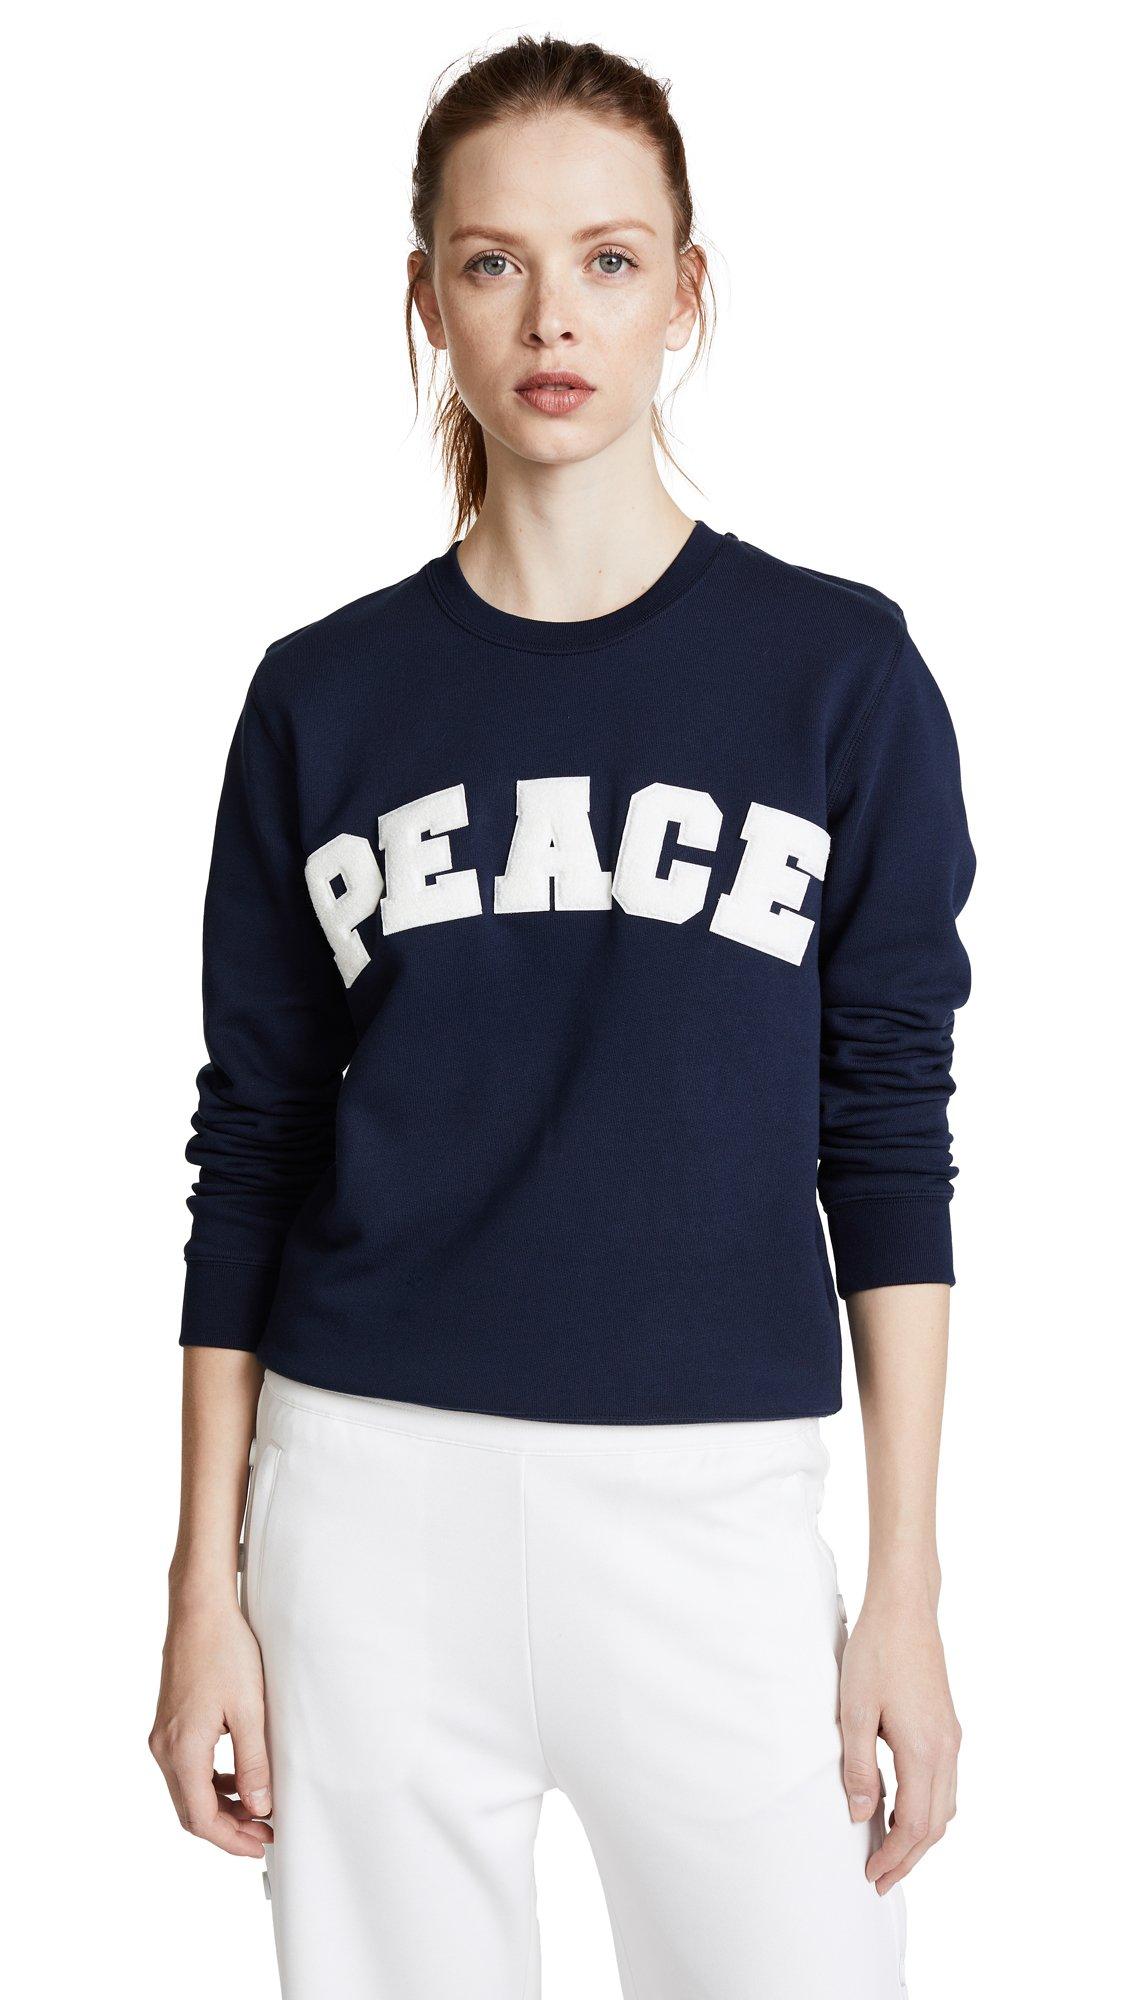 Tory Sport Women's Letterman Crew Sweater, Tory Navy, Medium